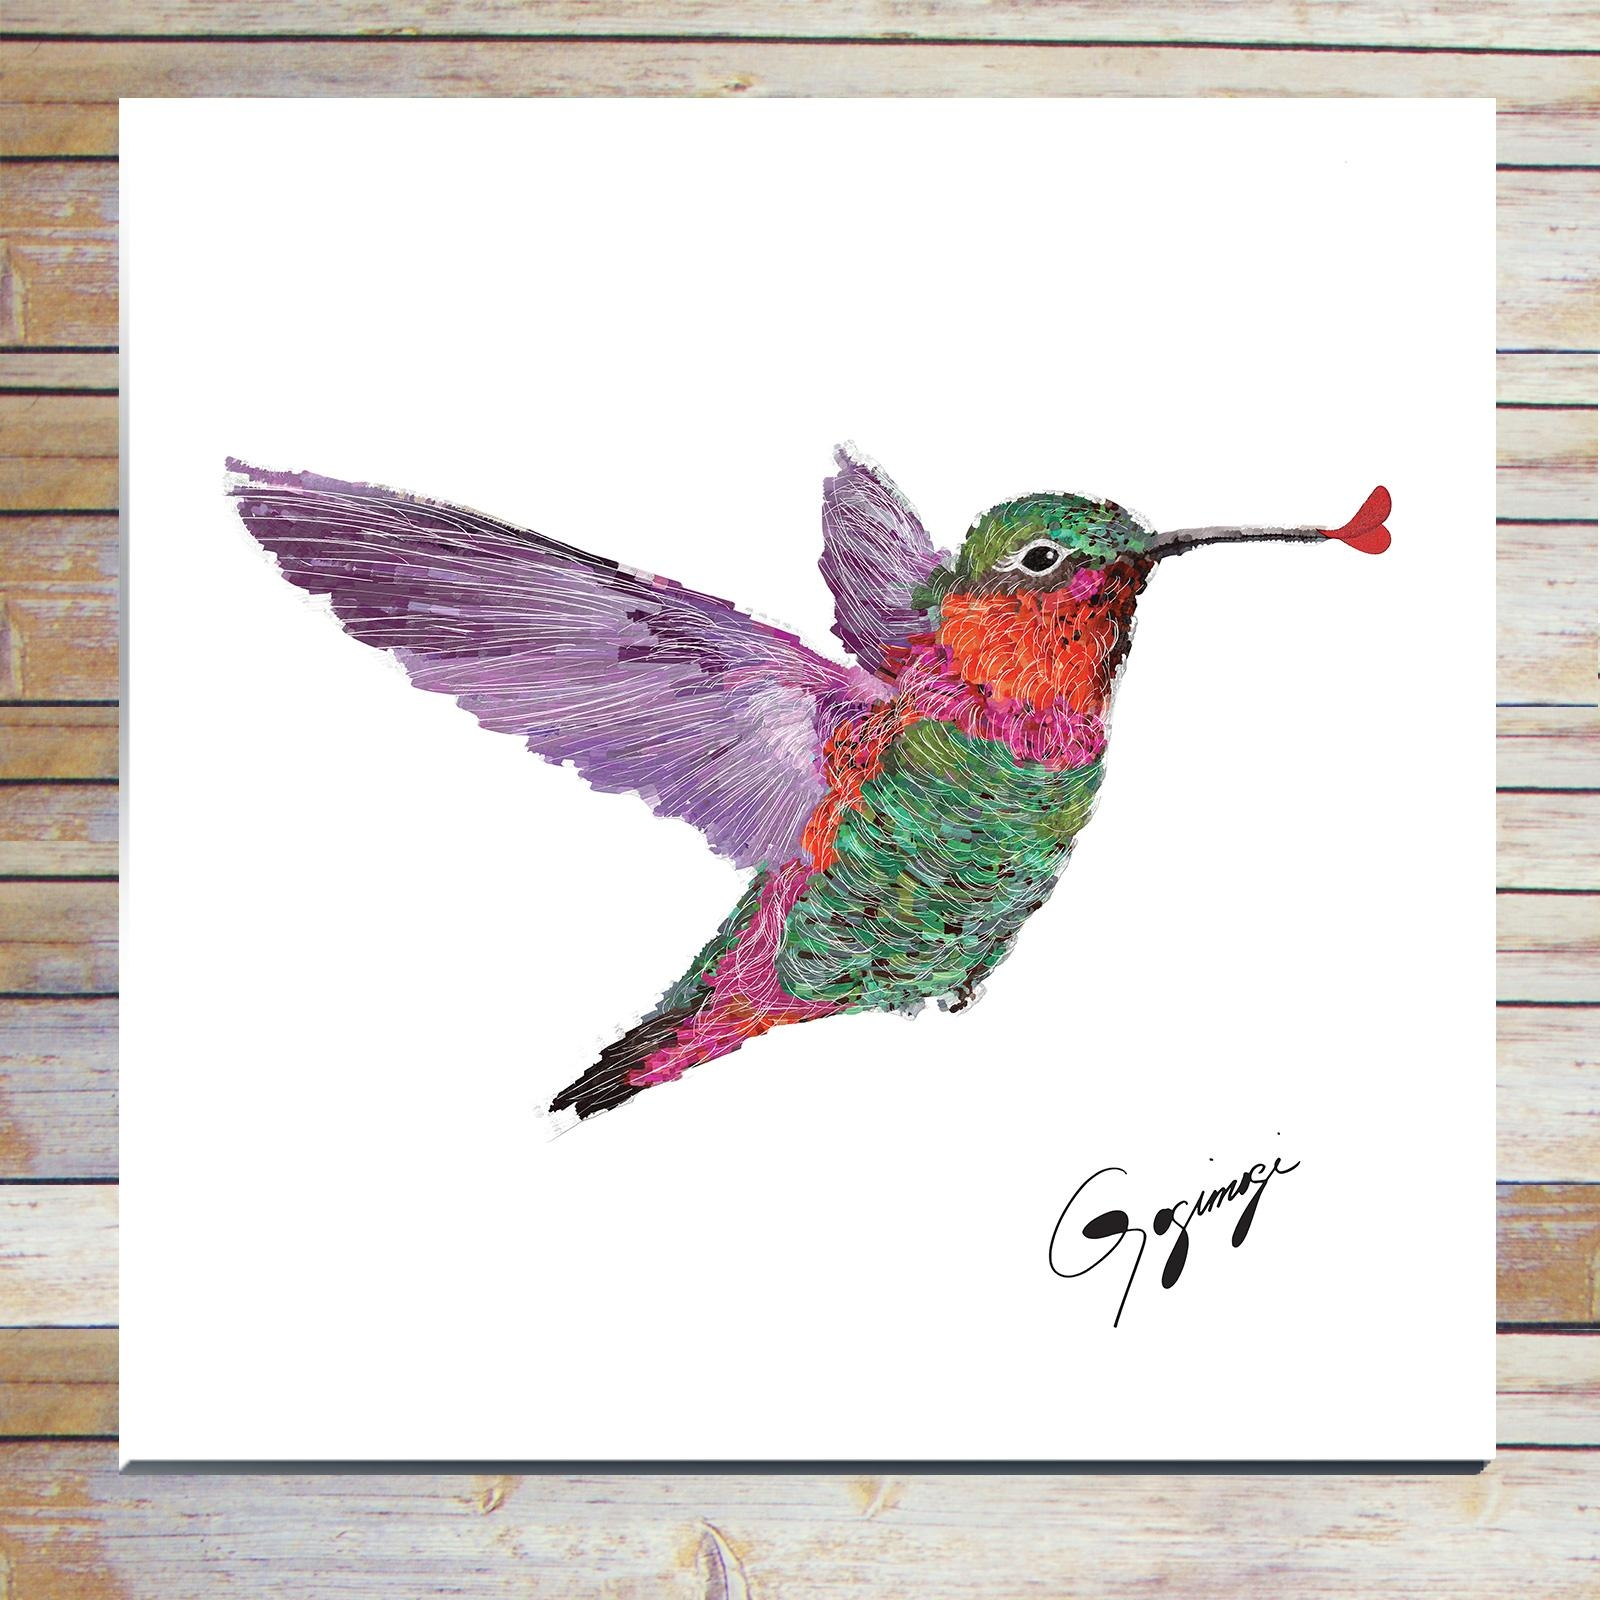 Hummingbird Wall Art On Glass Or Metal – Gogimogi With Regard To Hummingbird Metal Wall Art (Image 11 of 20)